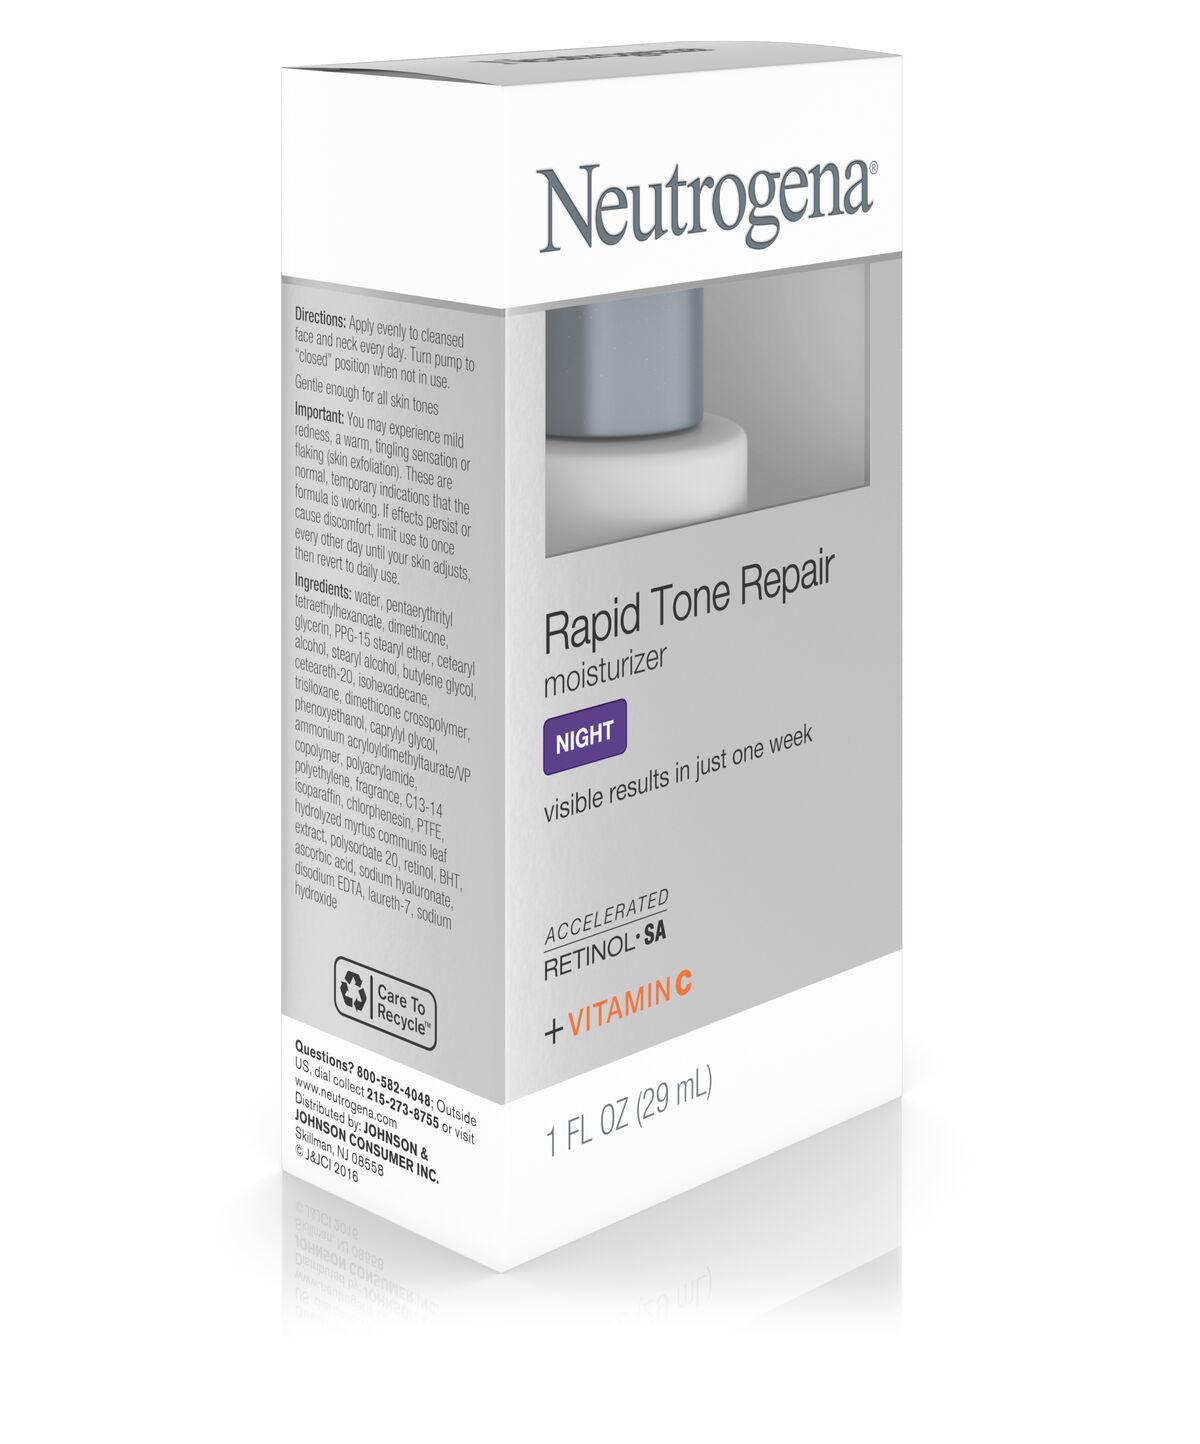 Rapid Tone Repair Dark Spot Corrector by Neutrogena #8